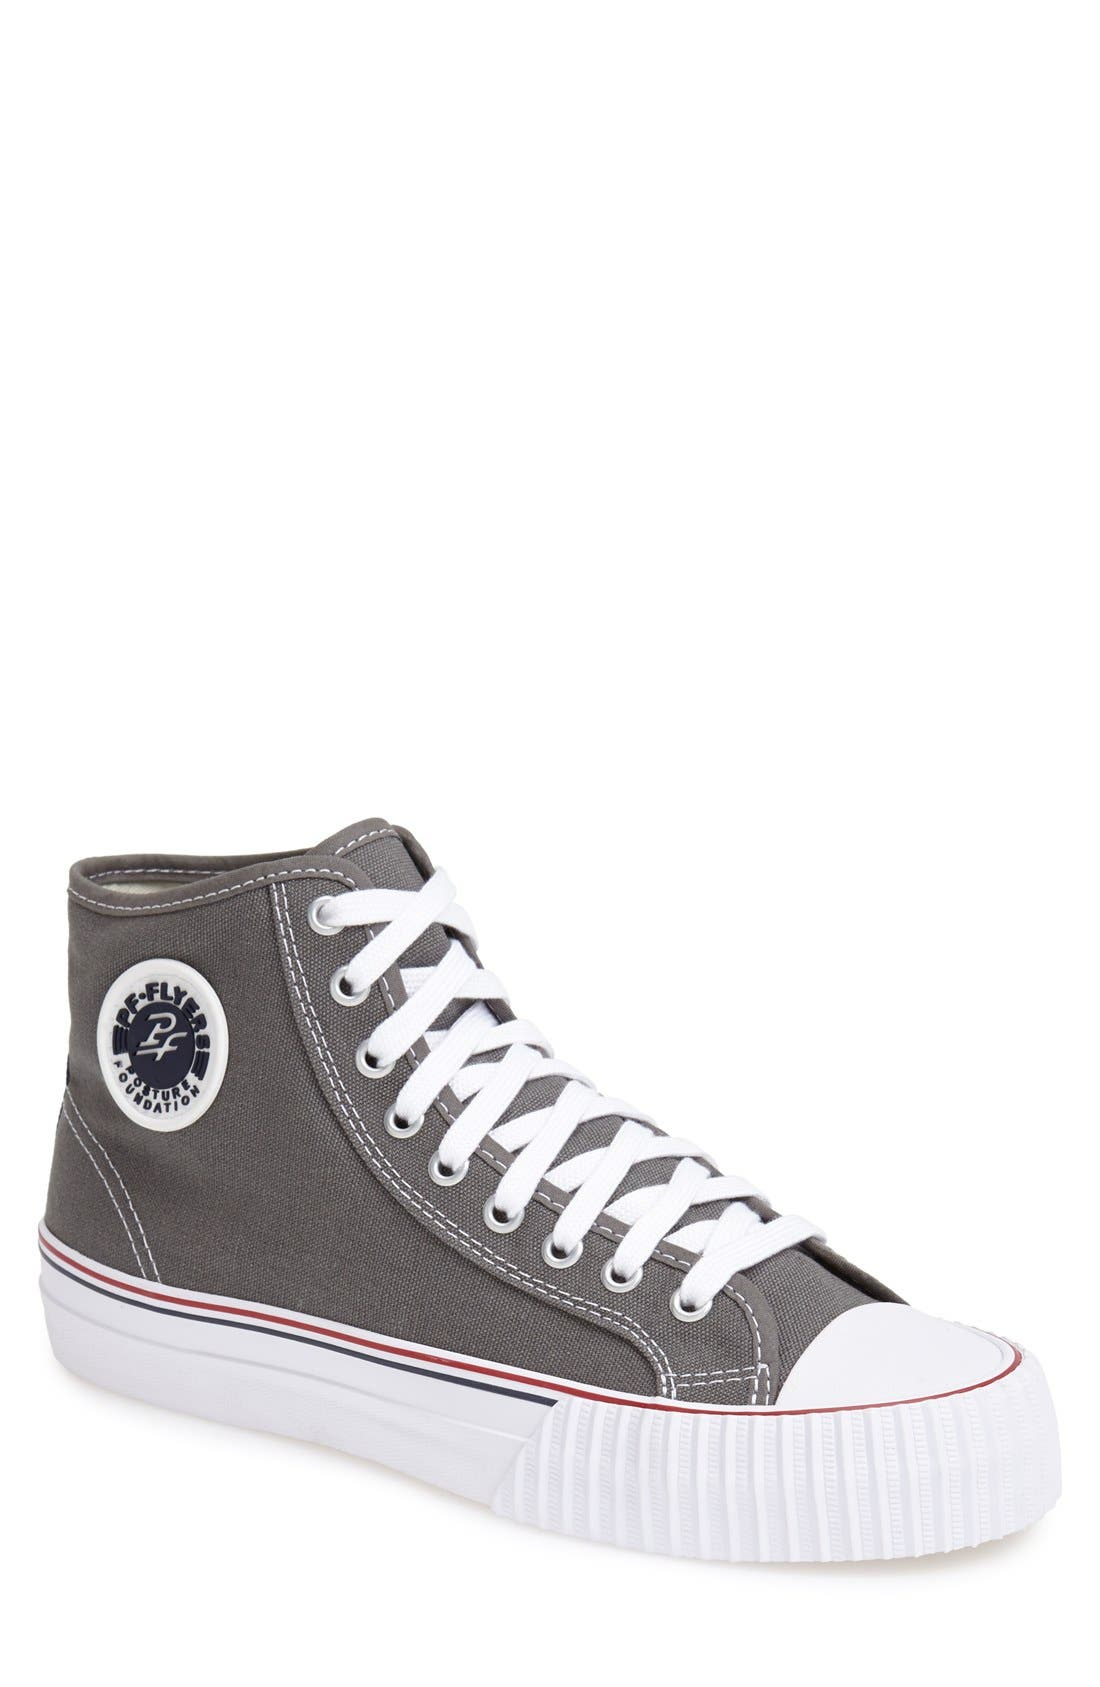 'Center Hi' Canvas Sneaker, Main, color, 030